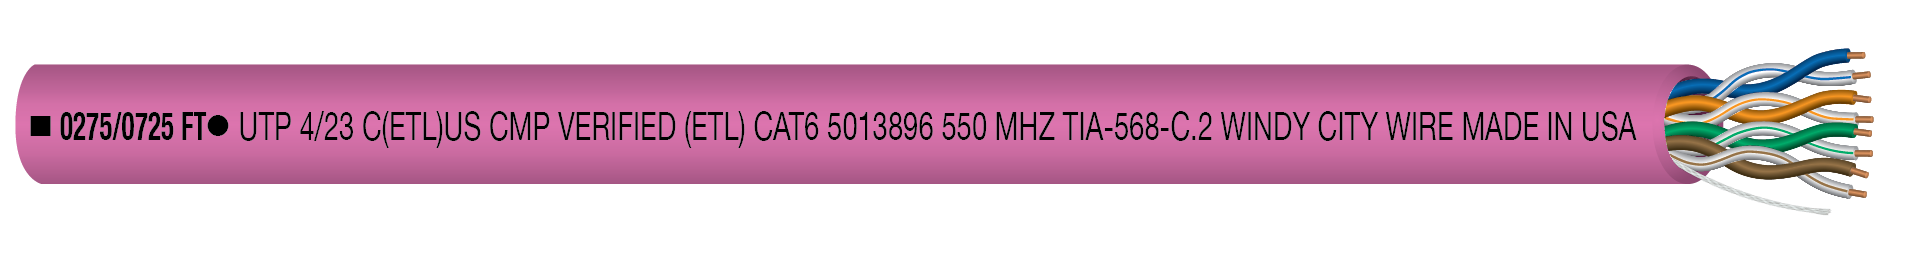 23-4P UNS SOL CMP C6 Pnk Jkt